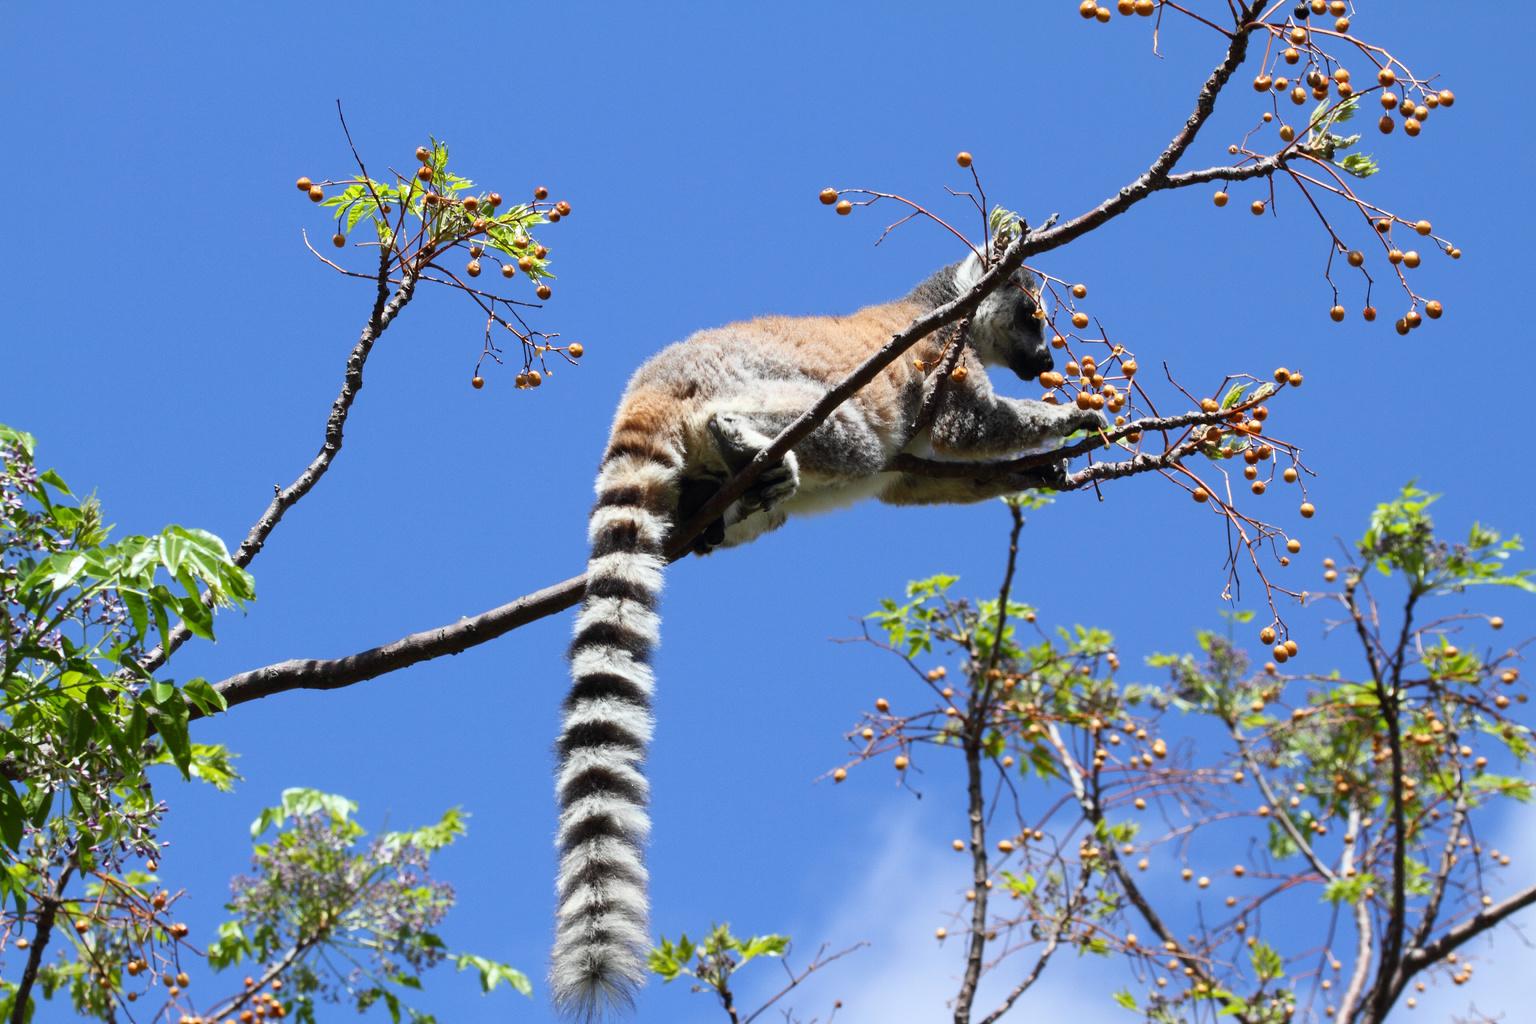 Gyűrűsfarkú maki Madagaszkáron. (Fotó: AFP)